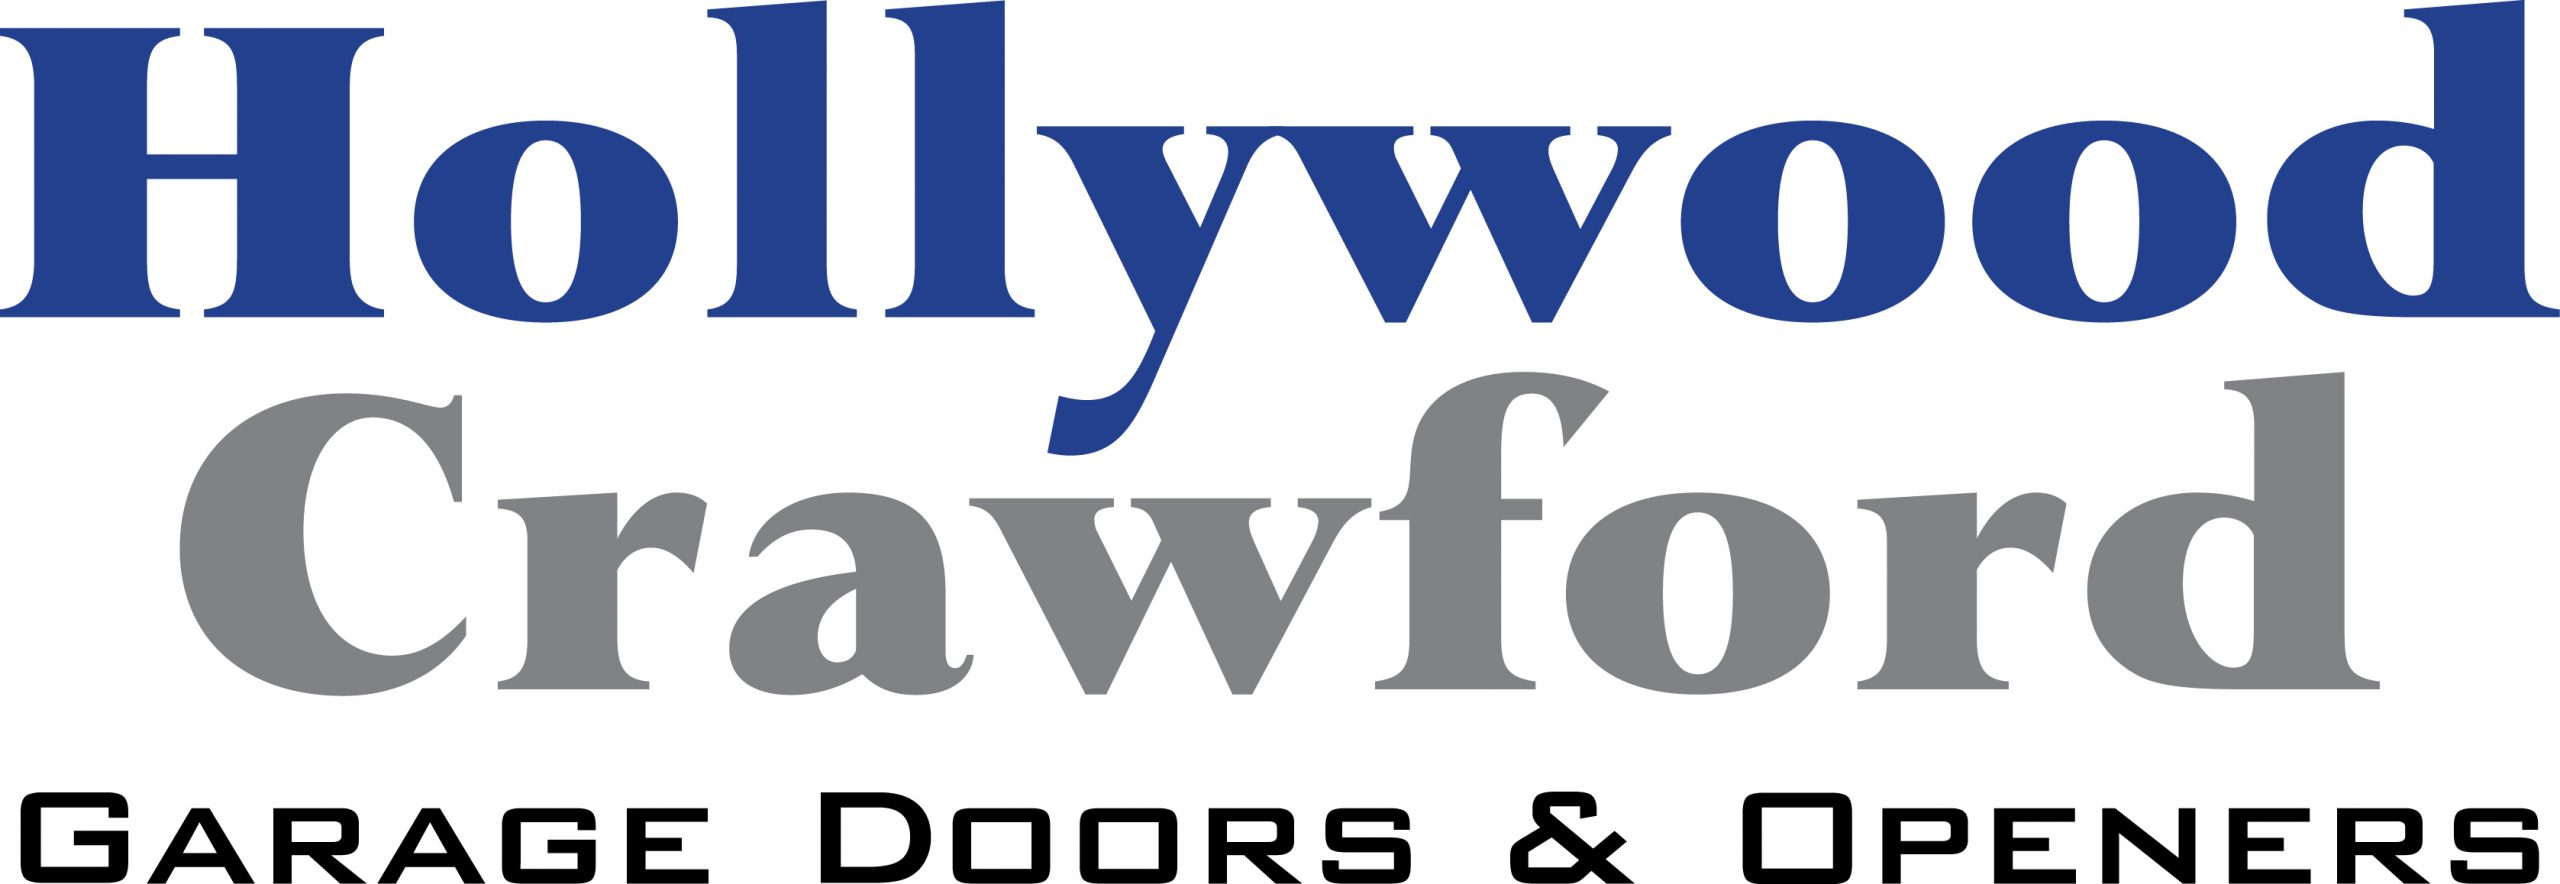 HollywoodCrawford_logo_stacked_RGB_300